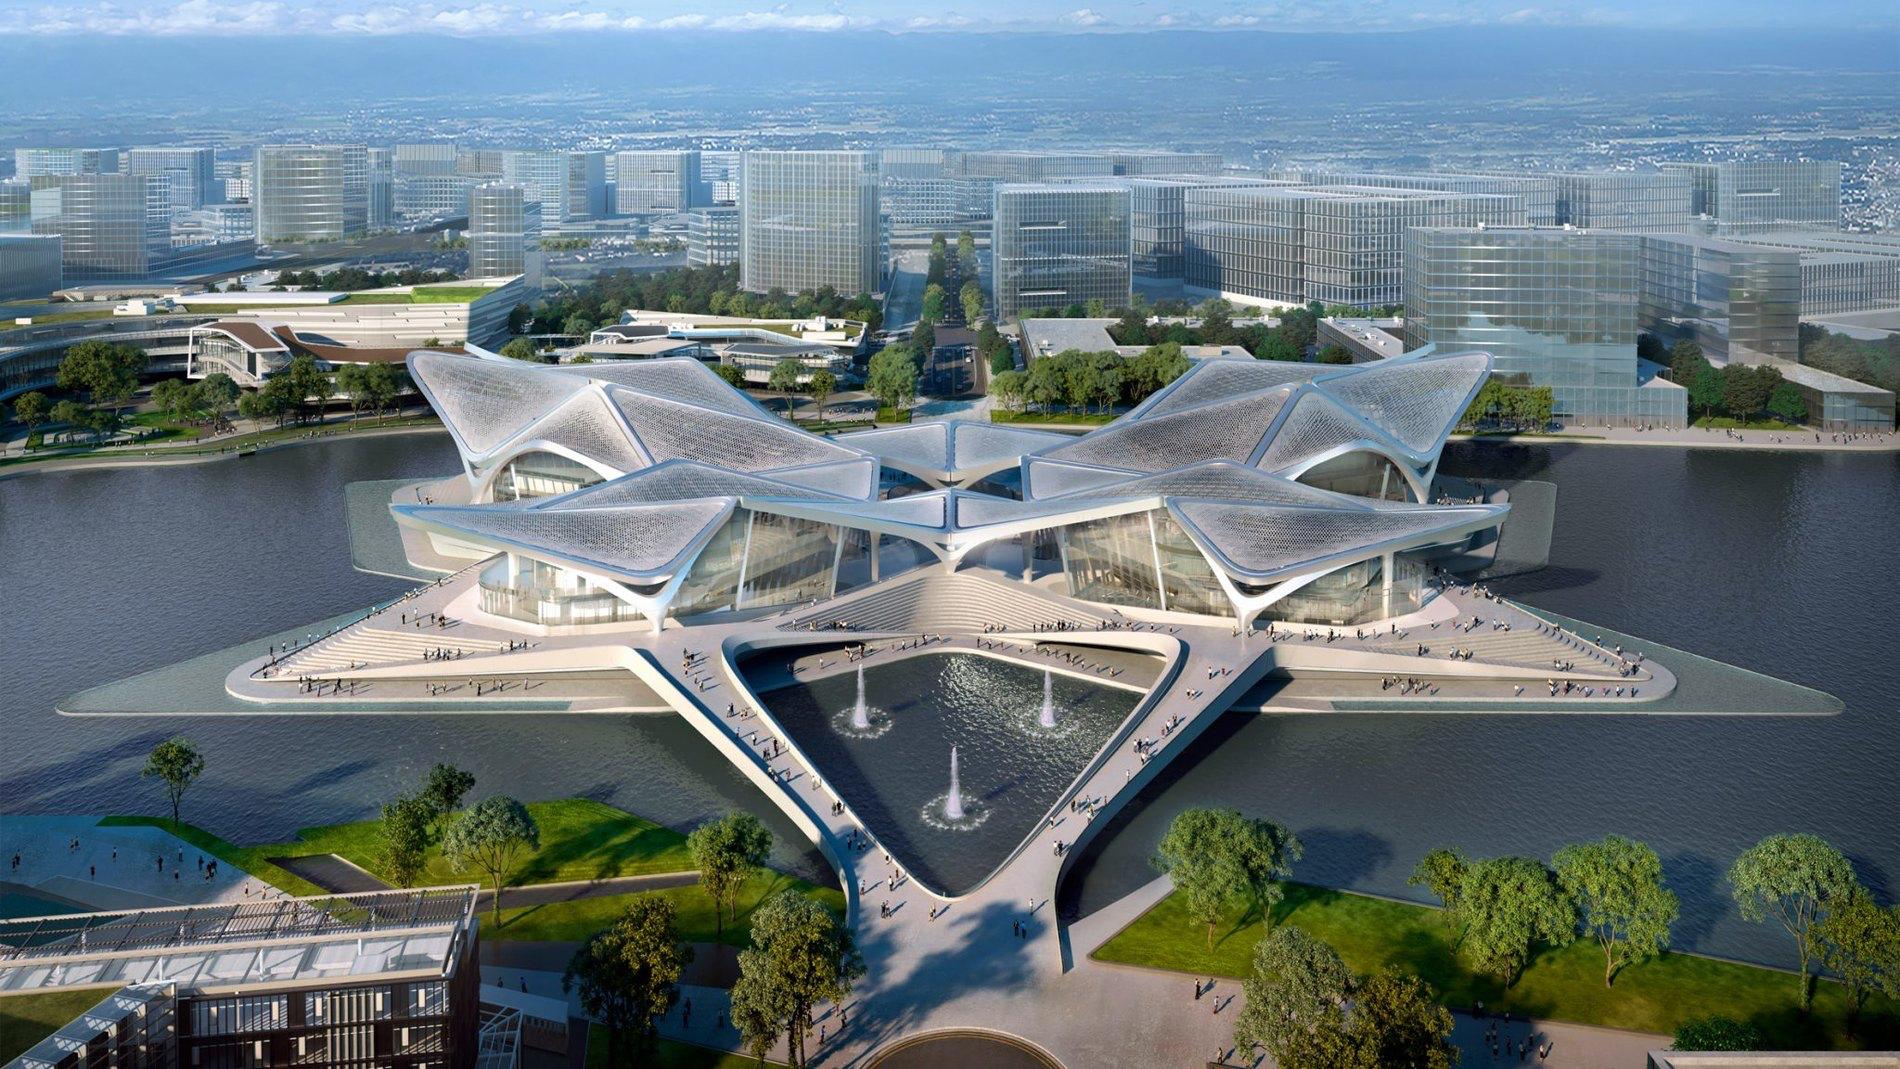 Zaha Hadid спроєктувало центр мистецтв у Китаї